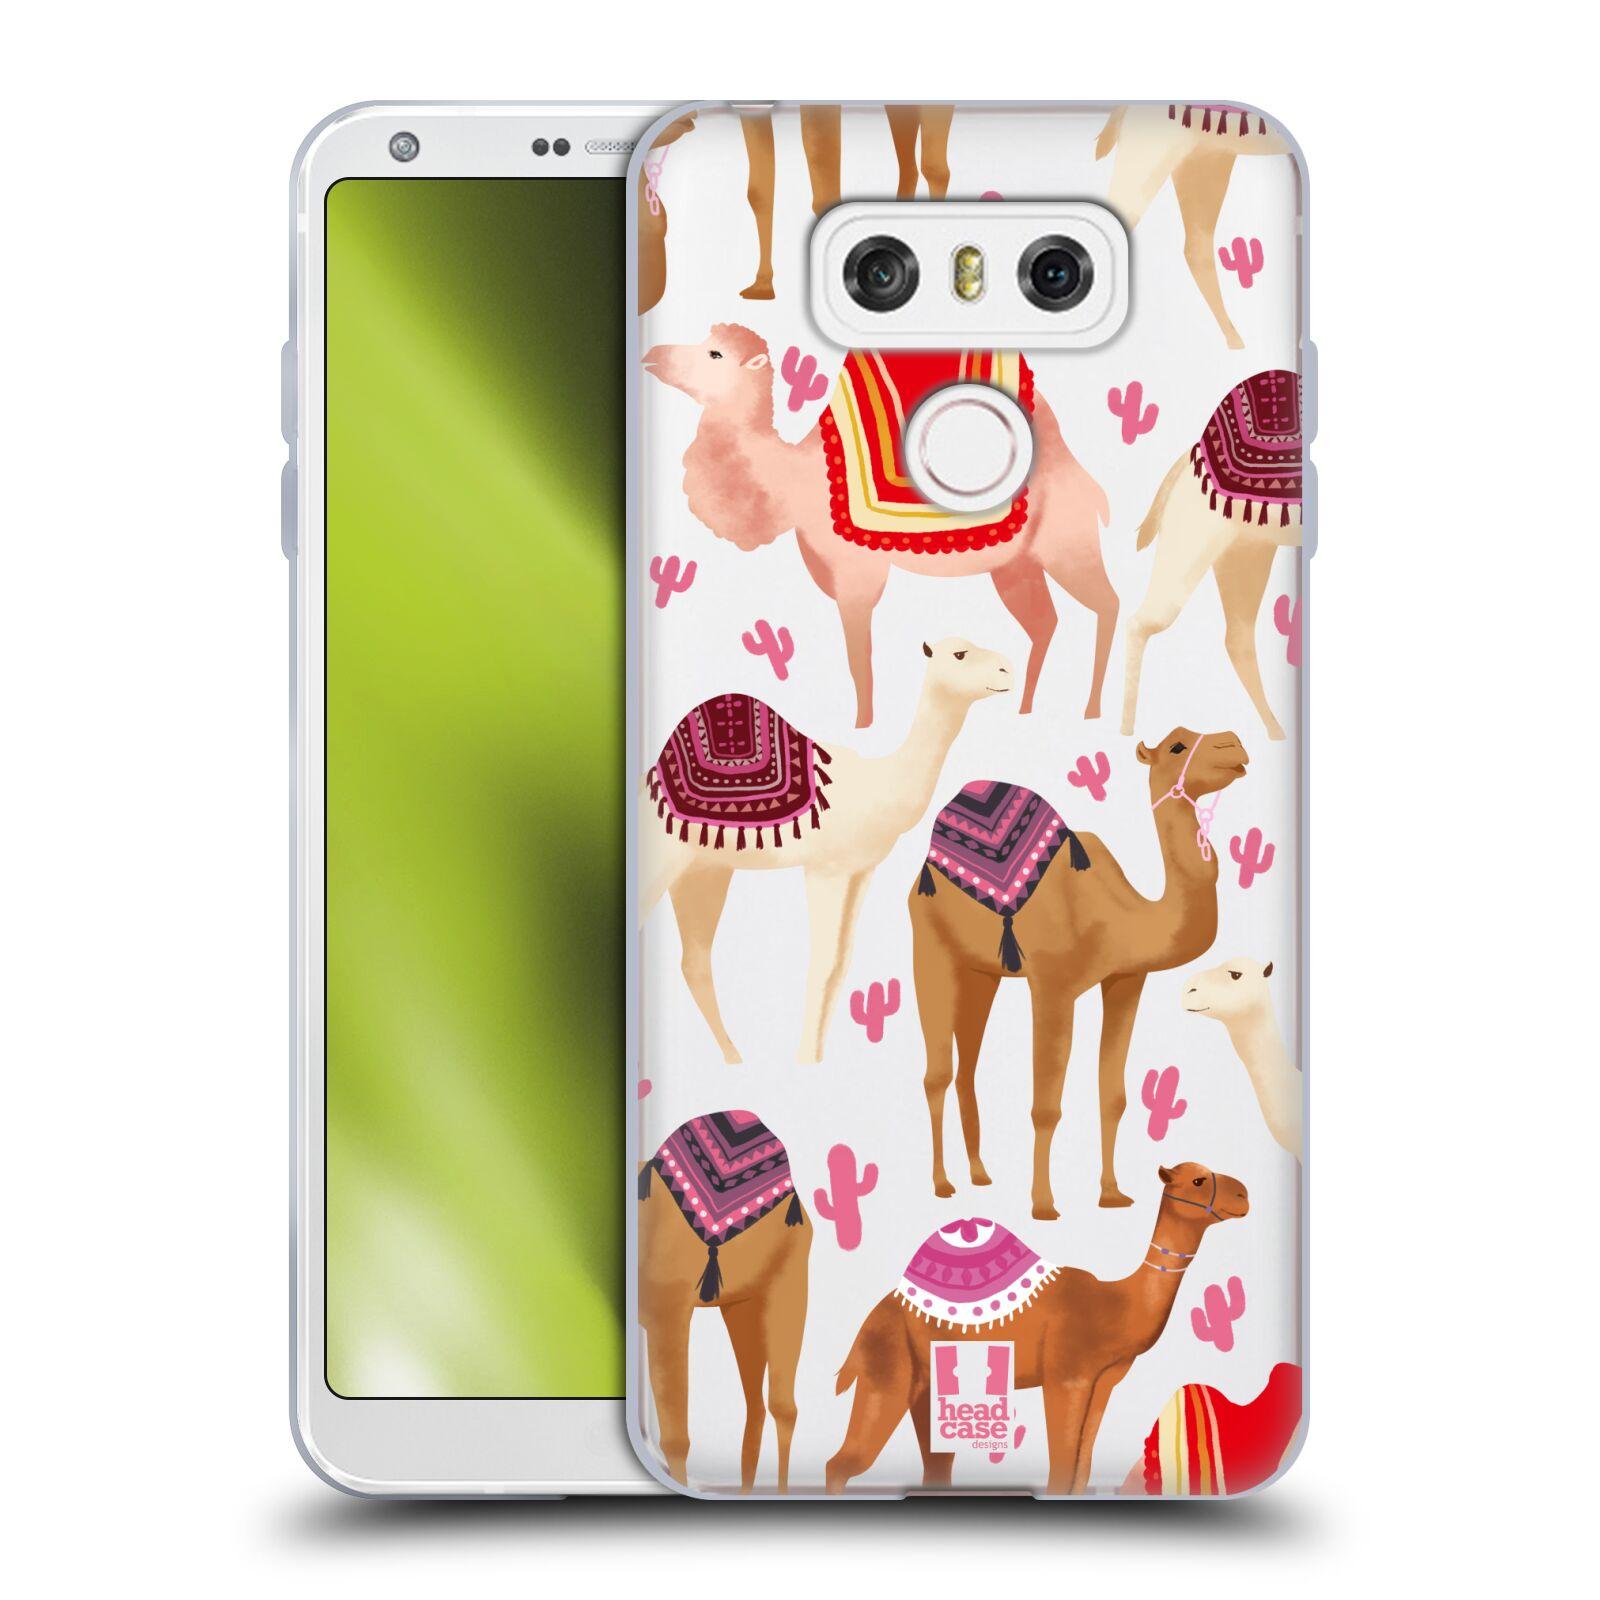 Disenos-de-Boho-Estilo-Suave-HEAD-CASE-Gel-caso-para-LG-Telefonos-1